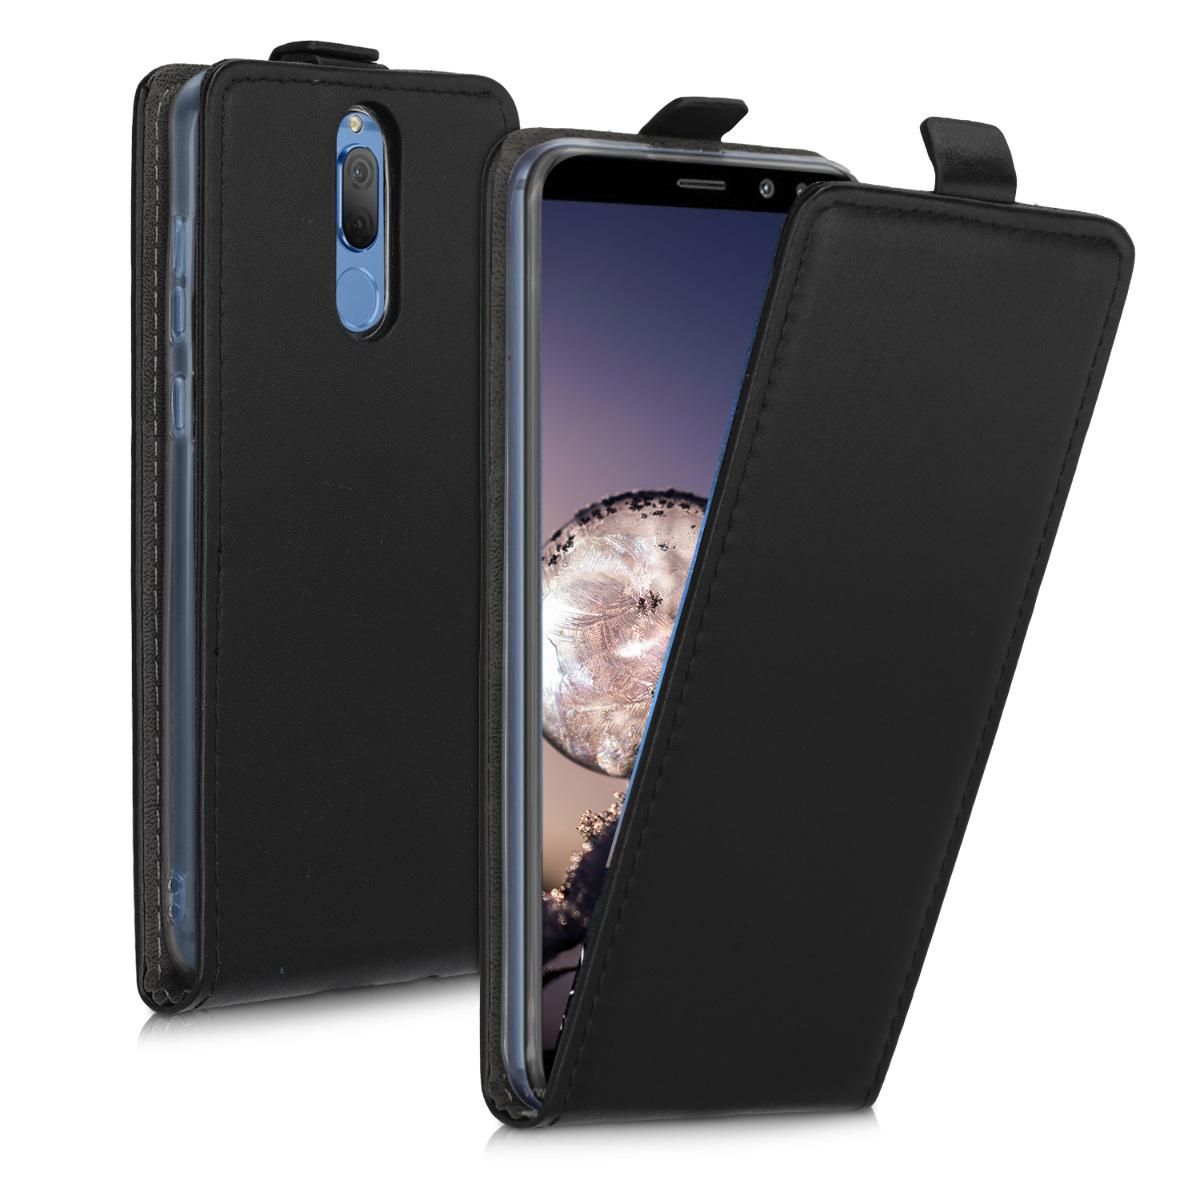 KW Flip Θήκη Huawei Mate 10 Lite - Black (50398.01)